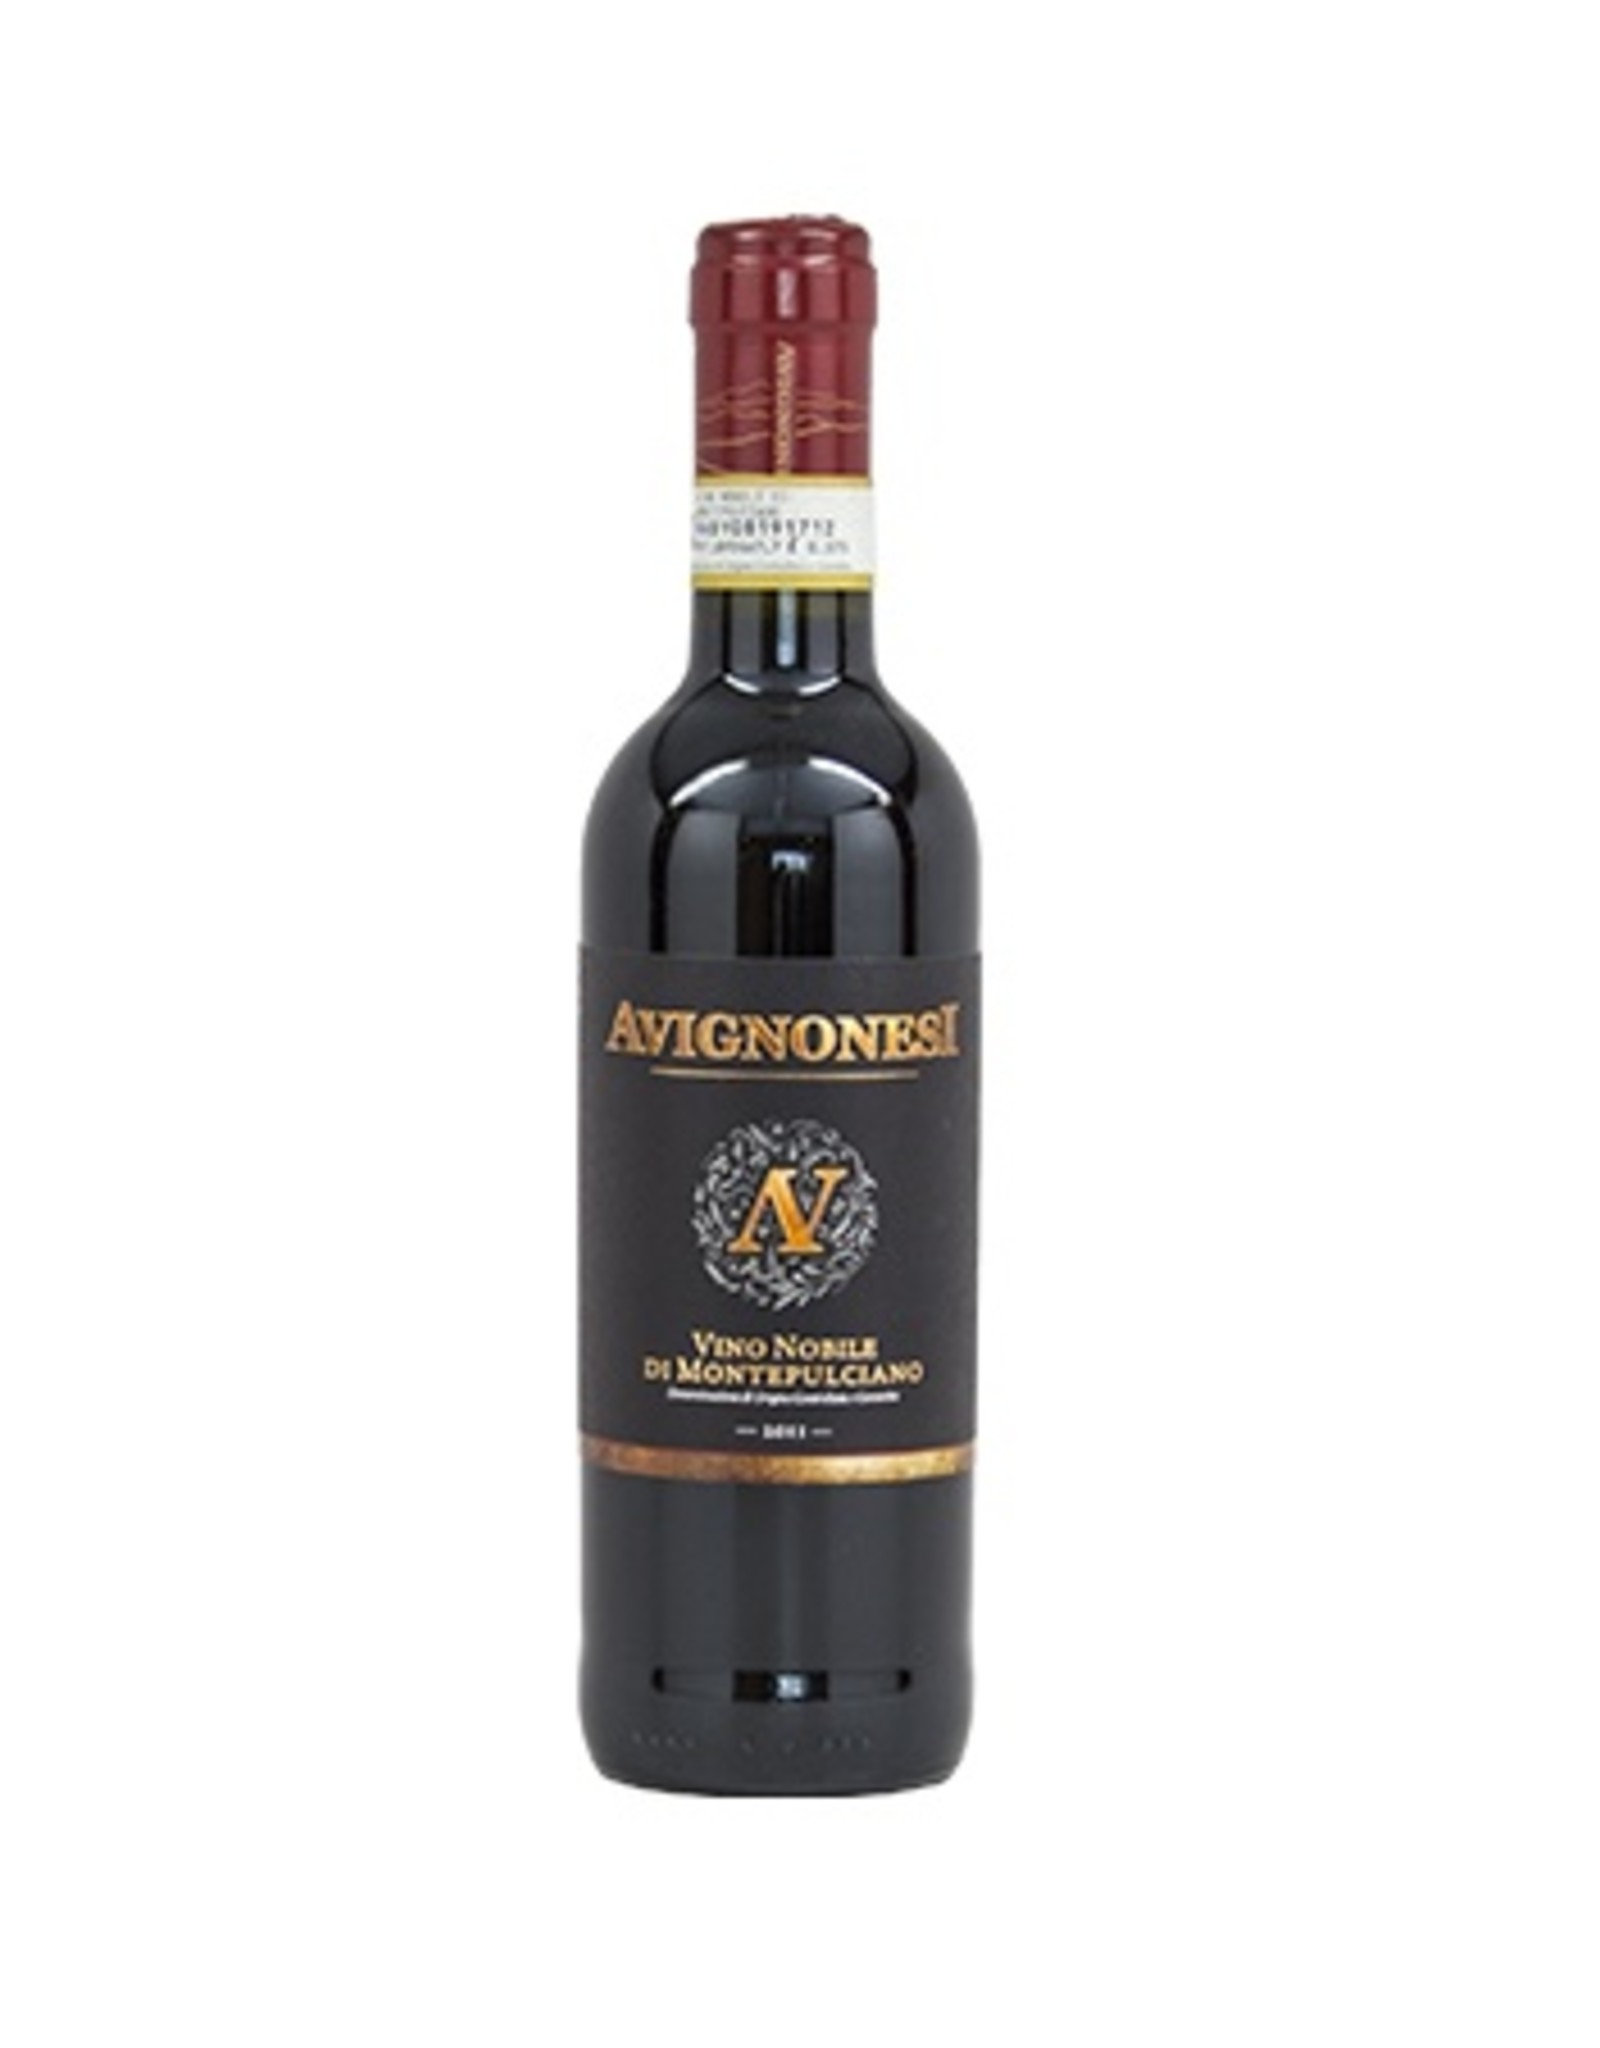 Avignonesi Vino Nobile Montepulciano 2016